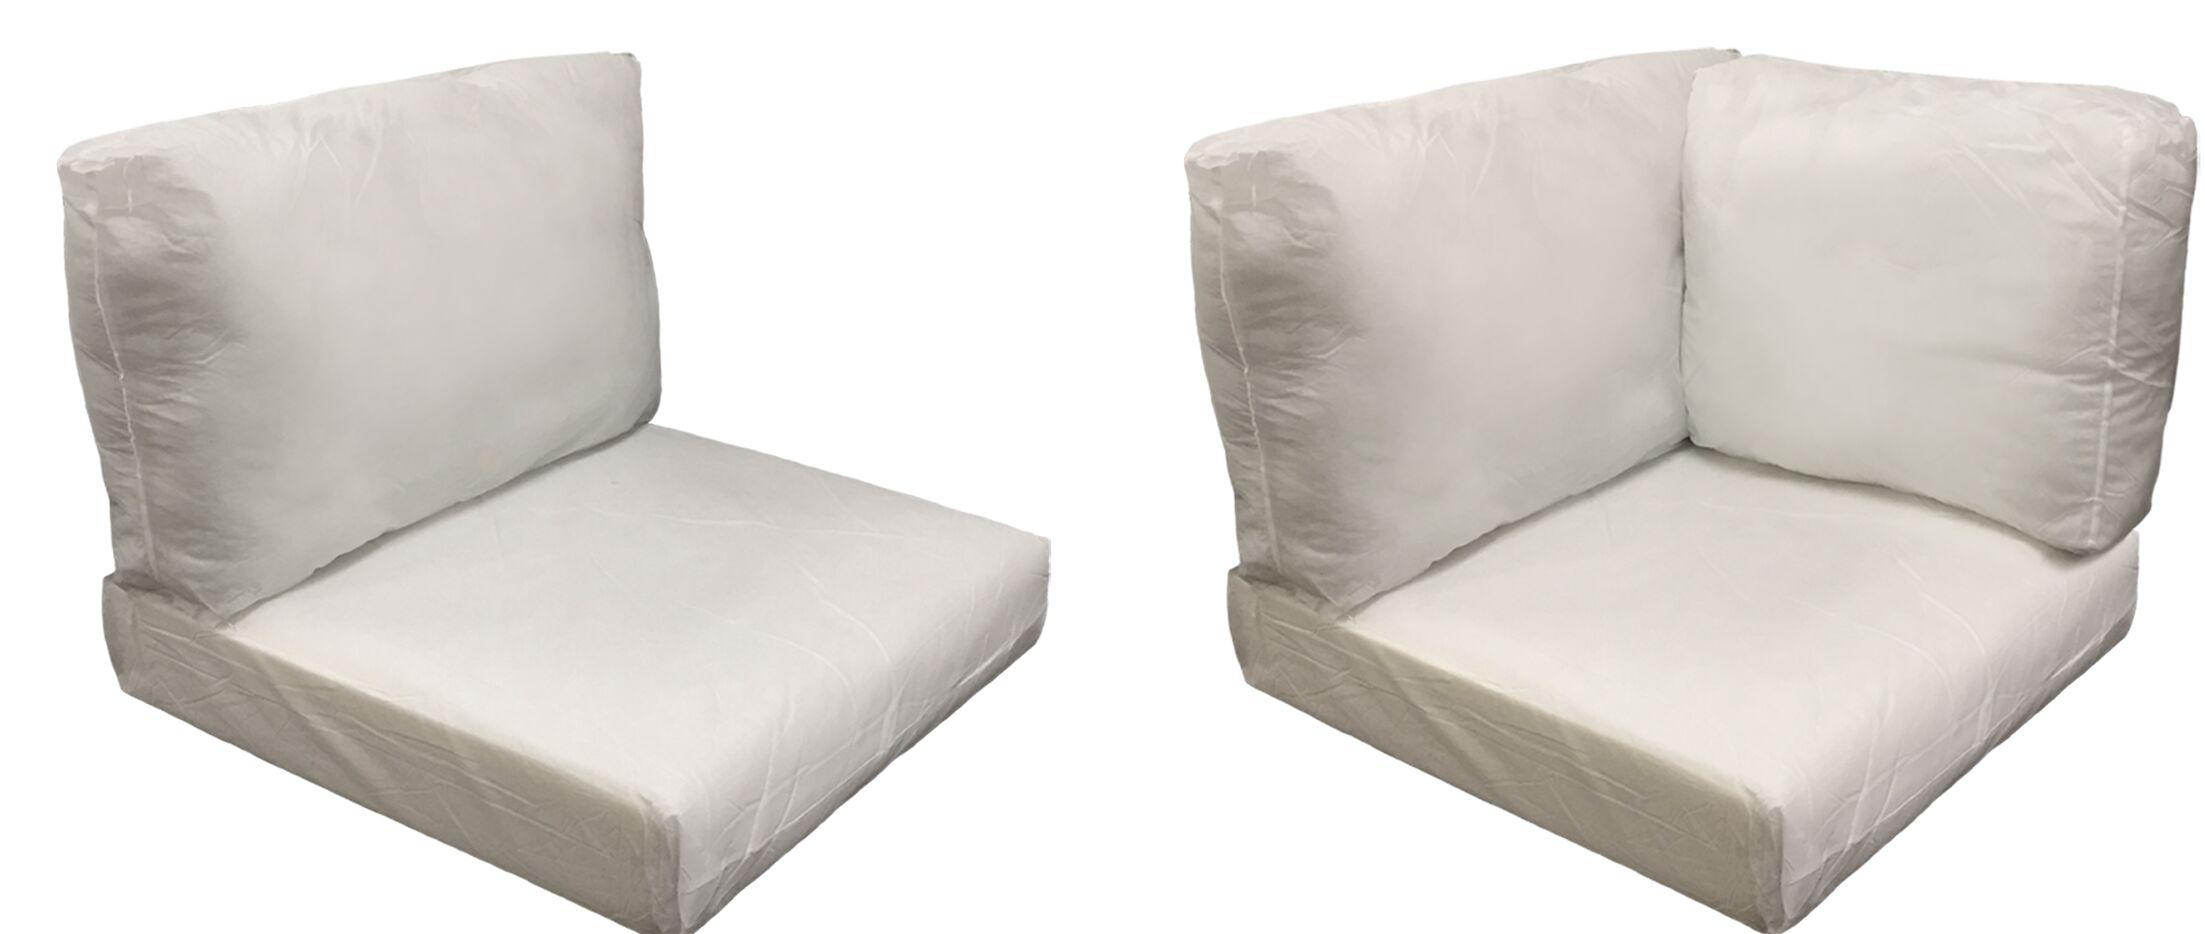 Eldredge Outdoor 10 Piece Lounge Chair Cushion Set